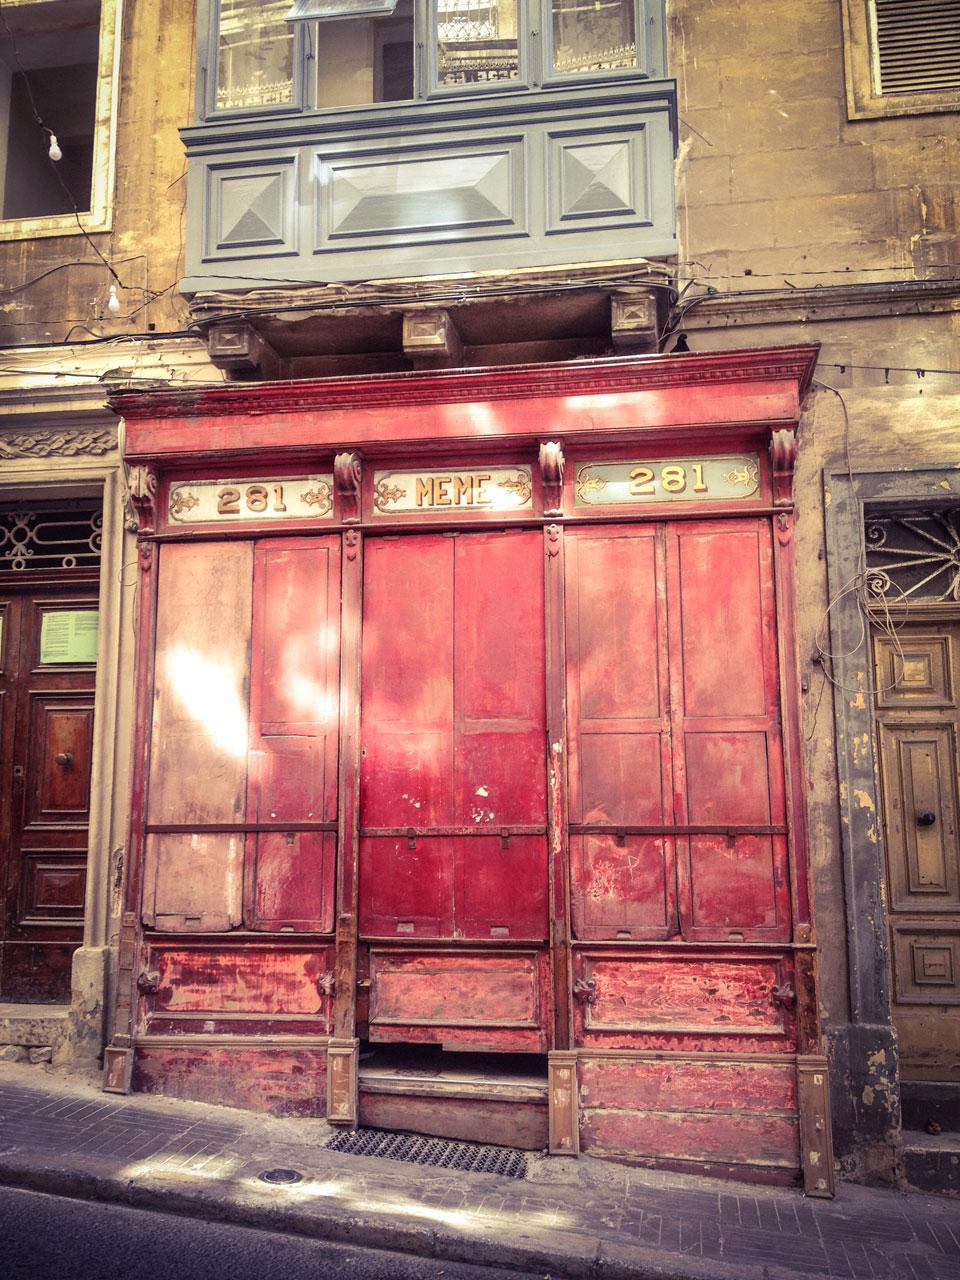 Disappearing Malta - doors, and facades ©Helen Jones-Florio. 'Meme' storefront, St Paul Street, Valletta